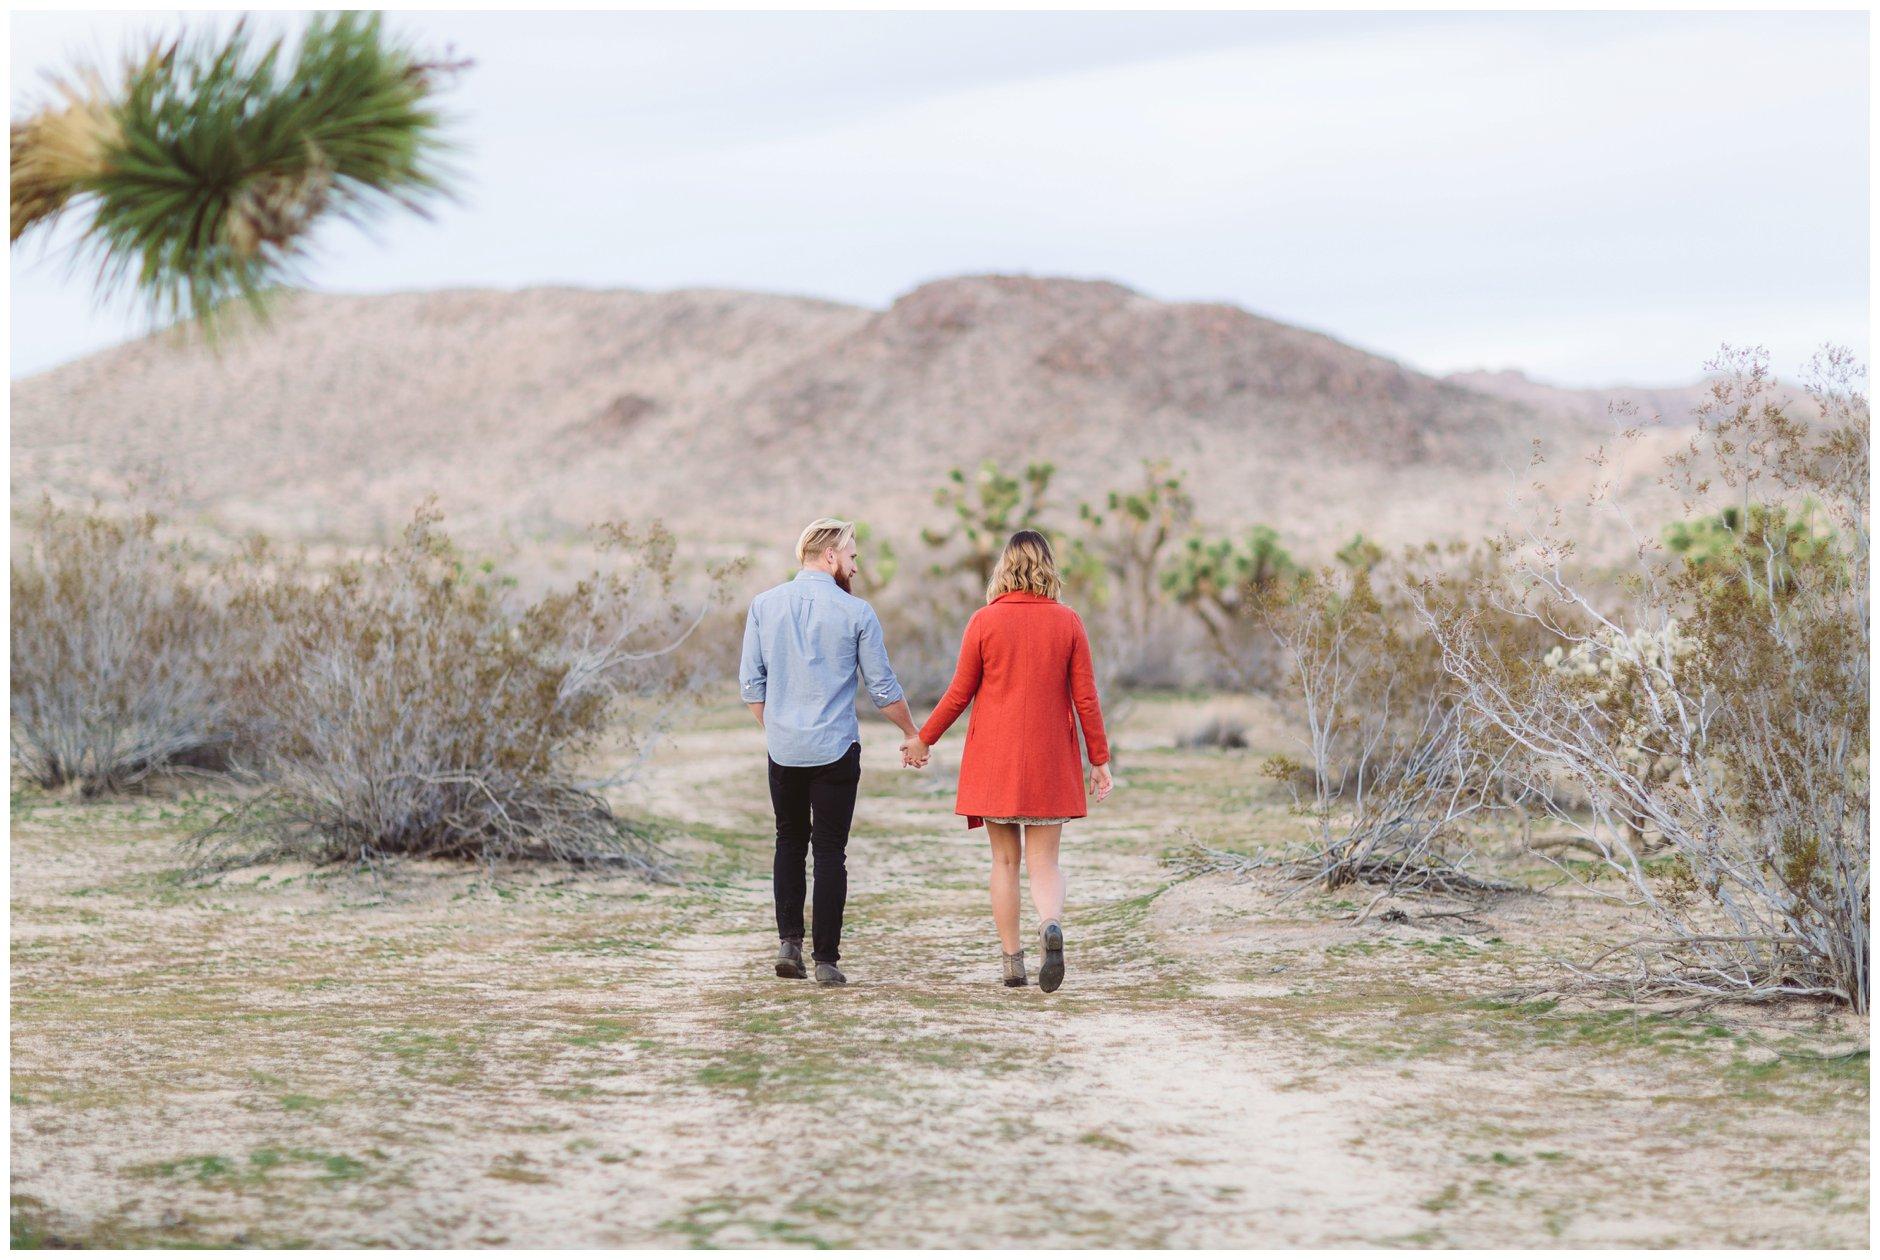 Fotograf-Eline-Jacobine-Kjærester-Joshua-Tree-California_0022